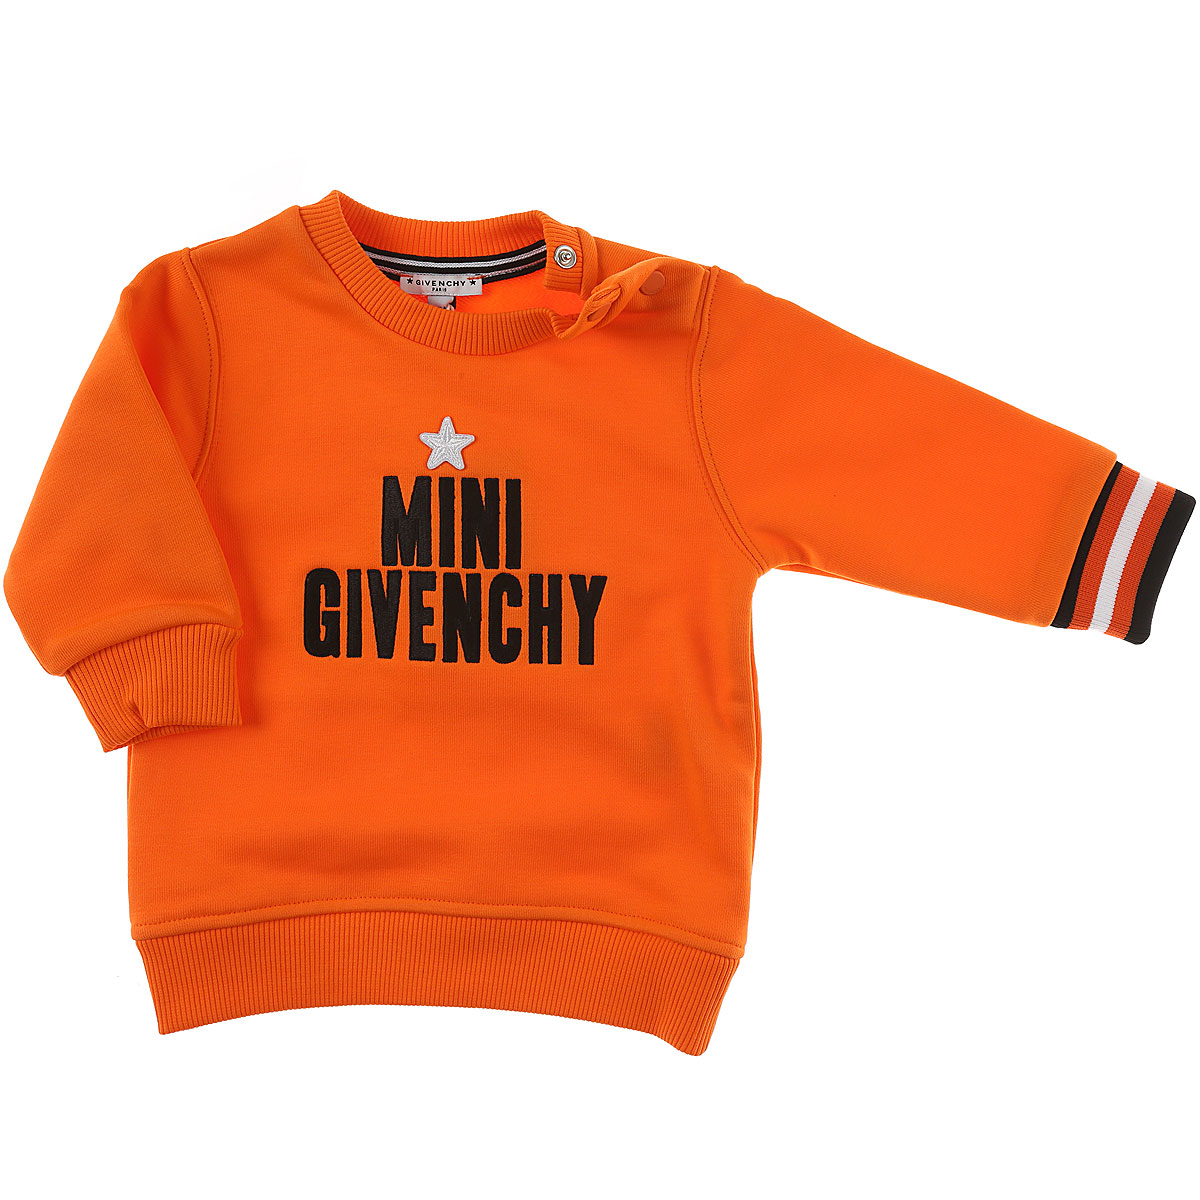 Image of Givenchy Baby Sweatshirts & Hoodies for Boys, Orange, Cotton, 2017, 12M 6M 9M